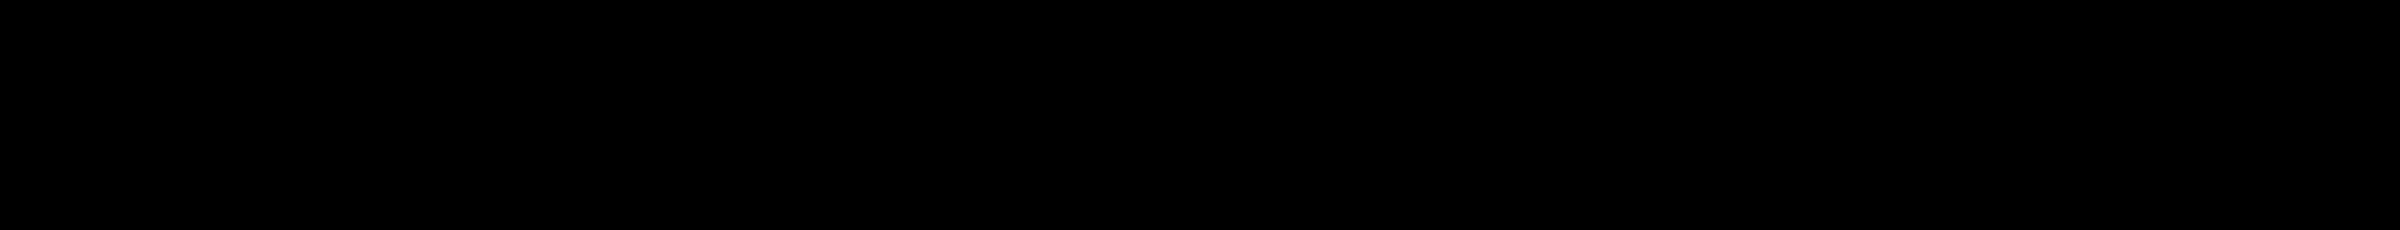 Png transparent images pluspng. Clipart ruler standard